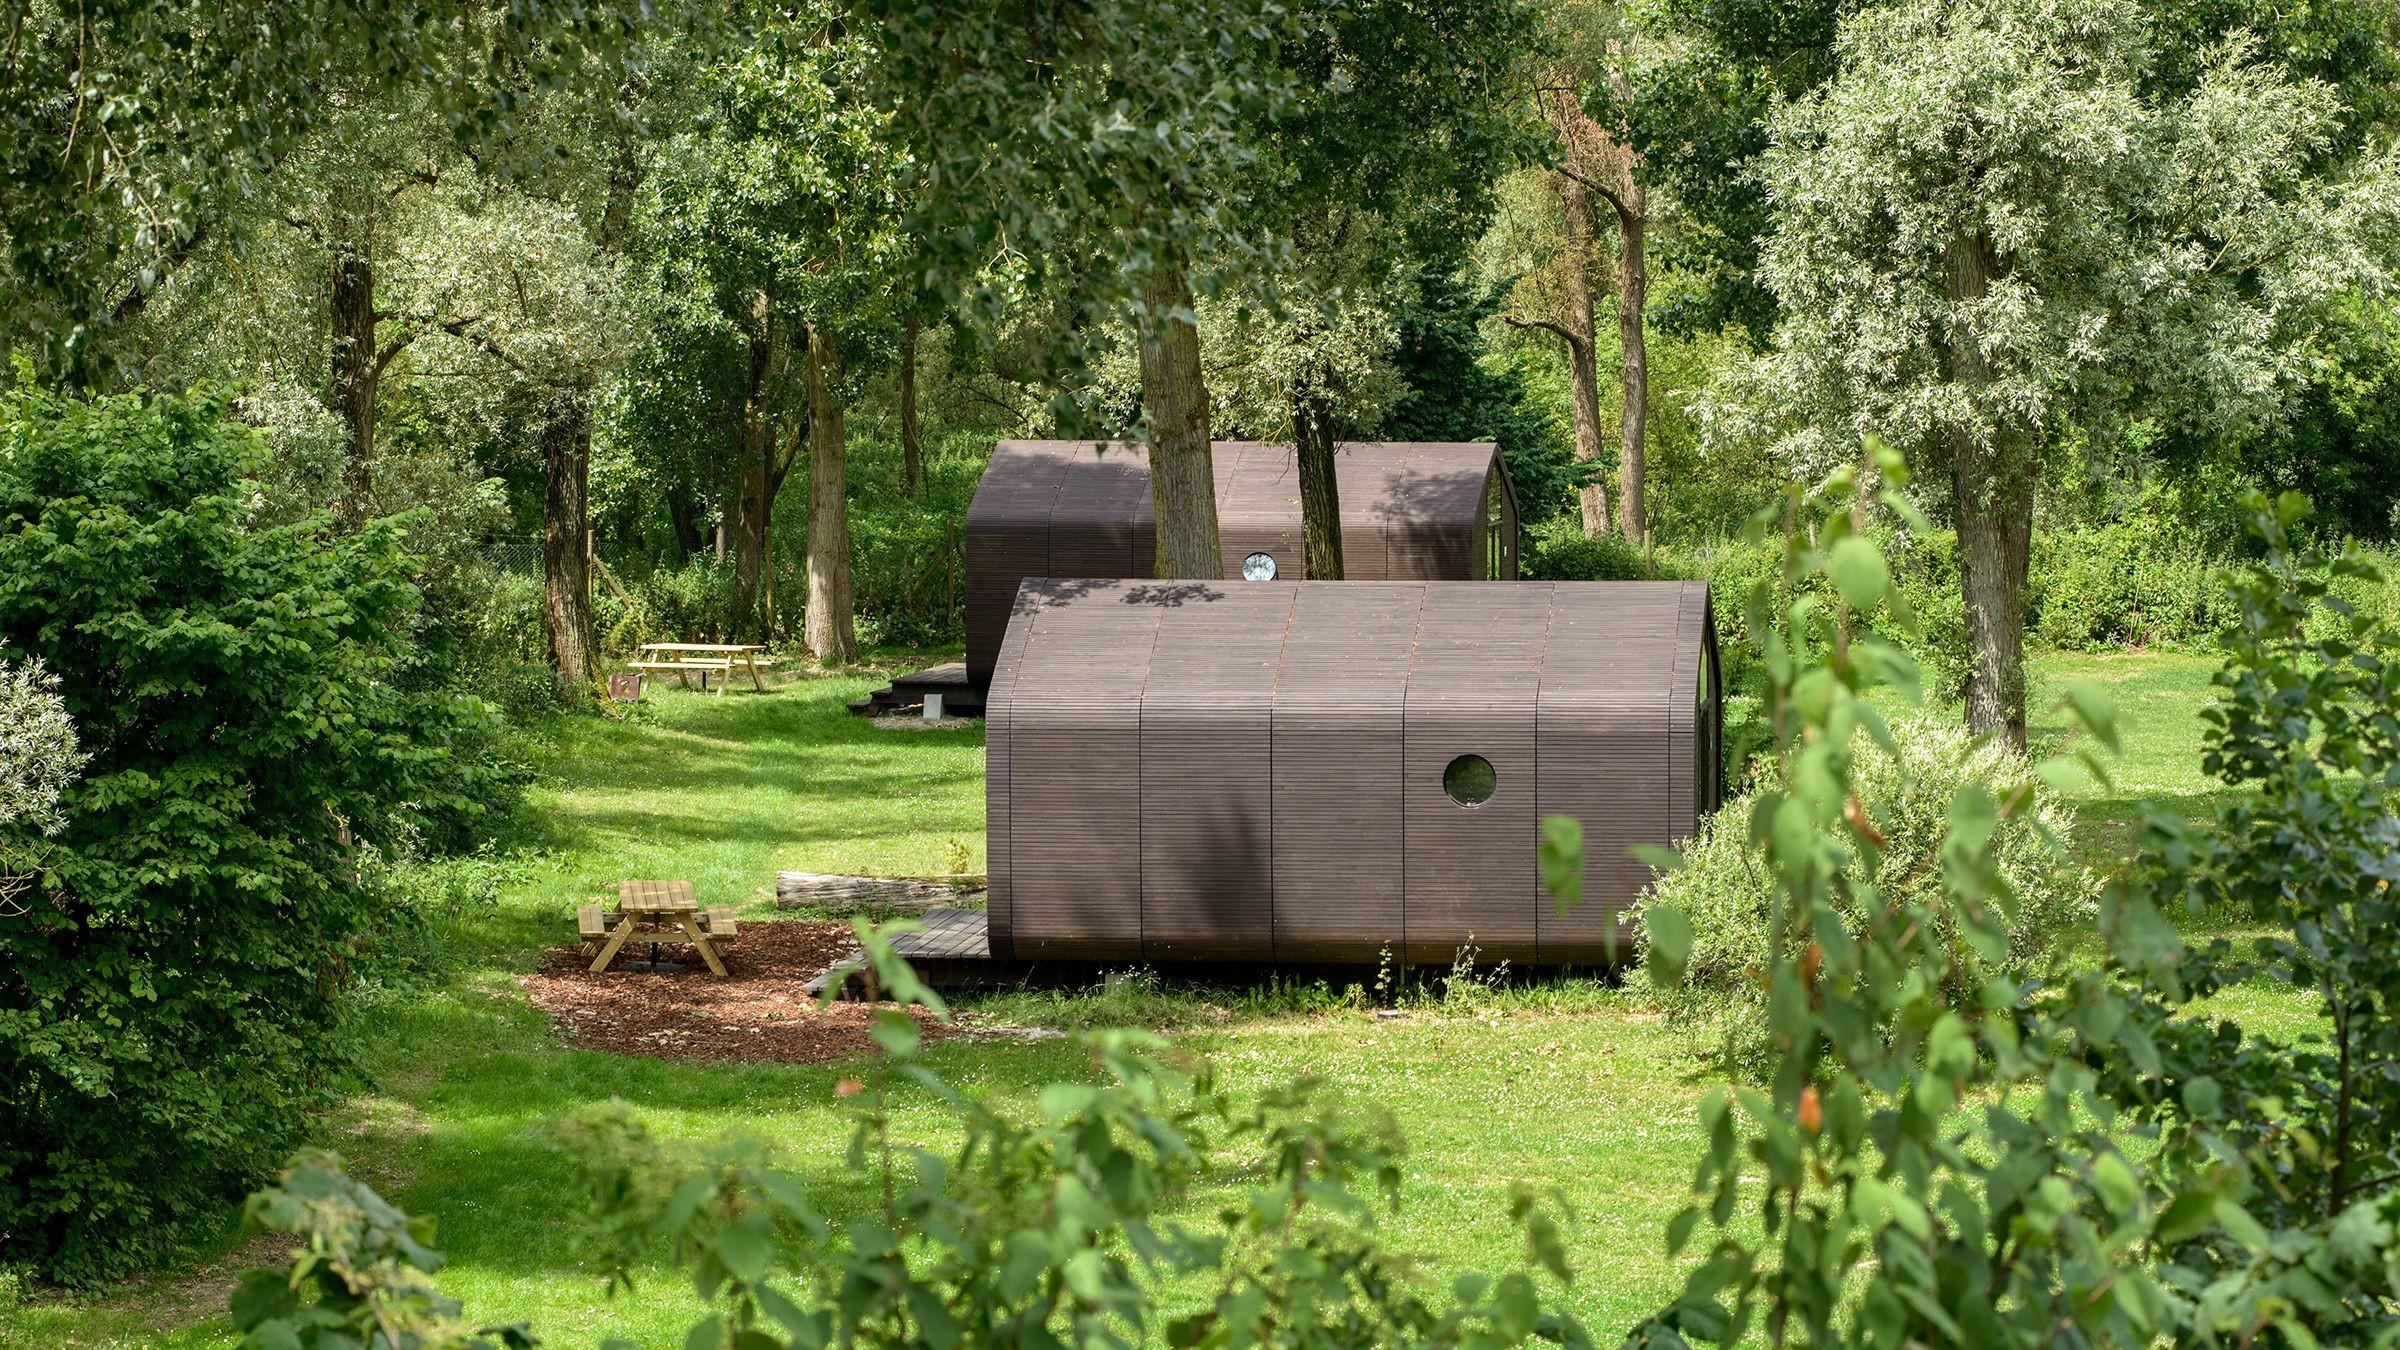 Nationalpark De Hoge Veluwe Hotel Stayokay Apeldoorn